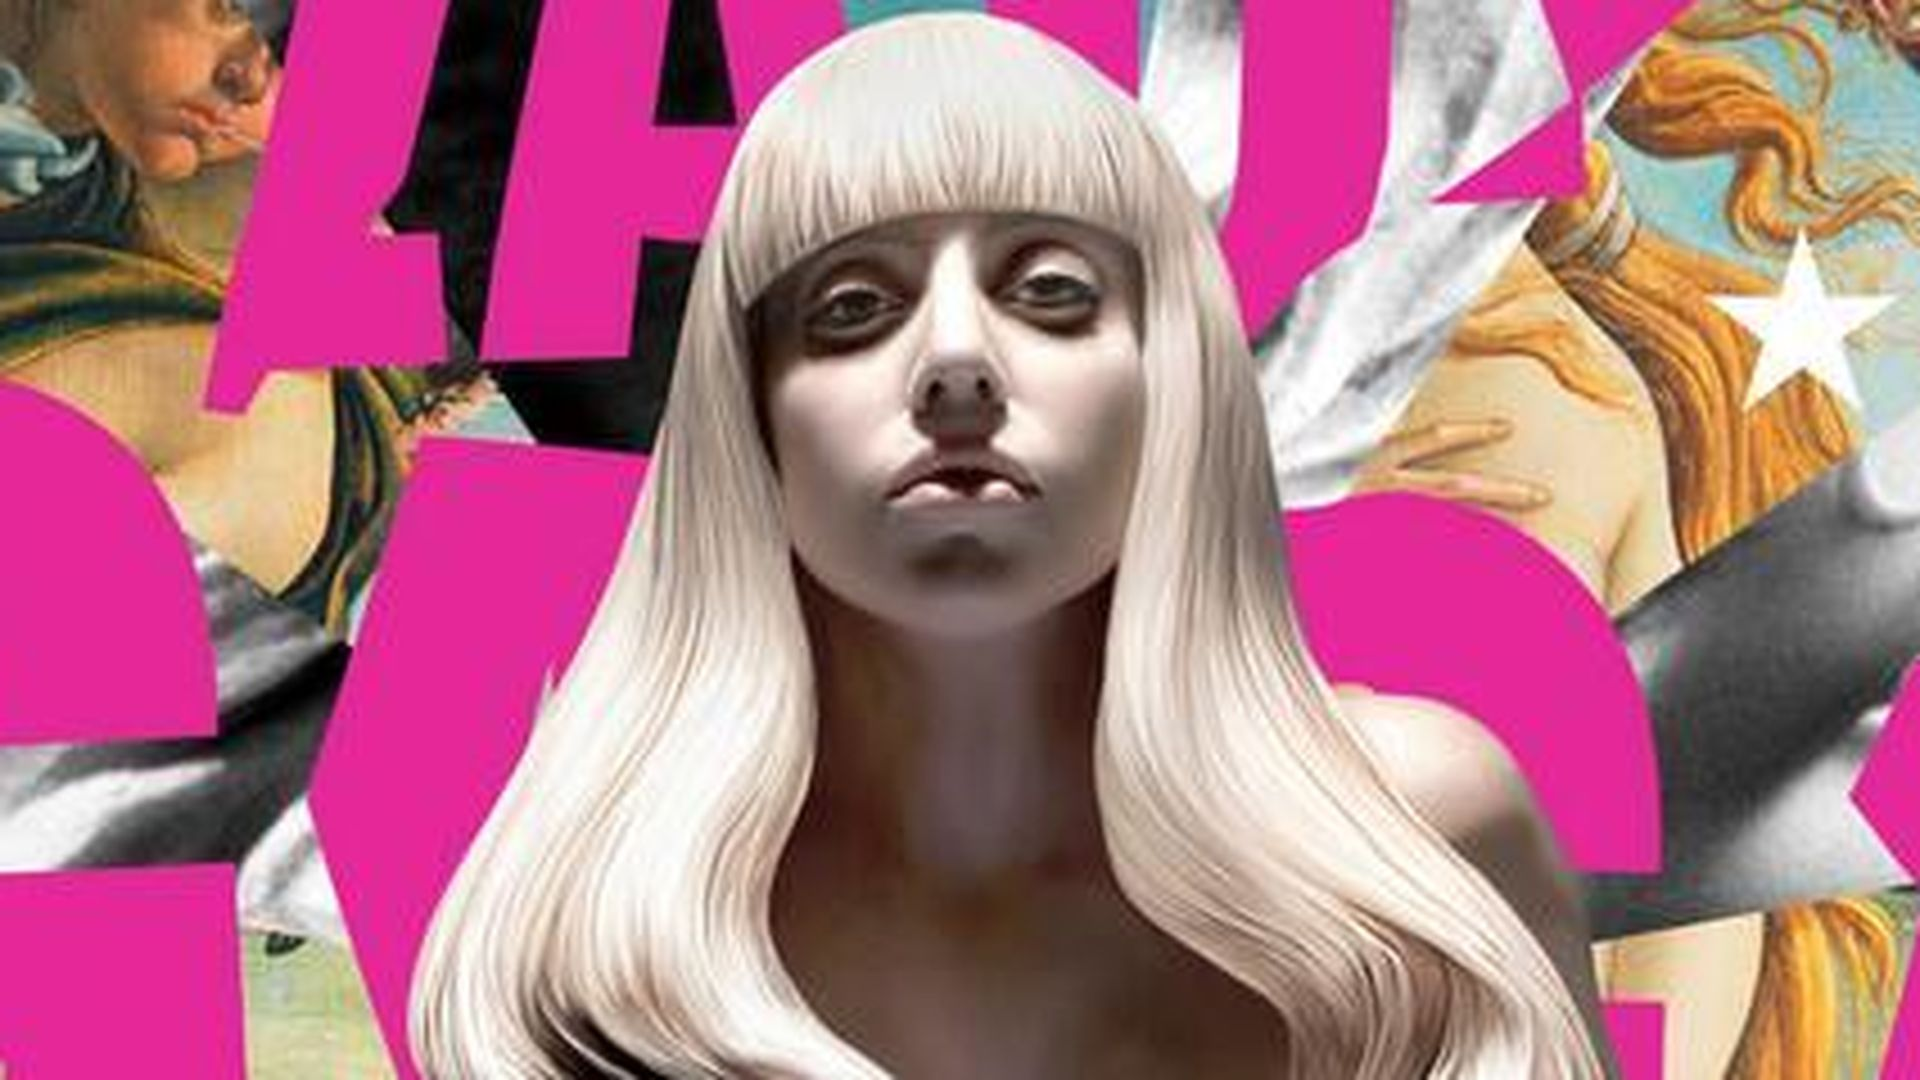 Lady Gagas ARTPOP album artwork censored for sale in